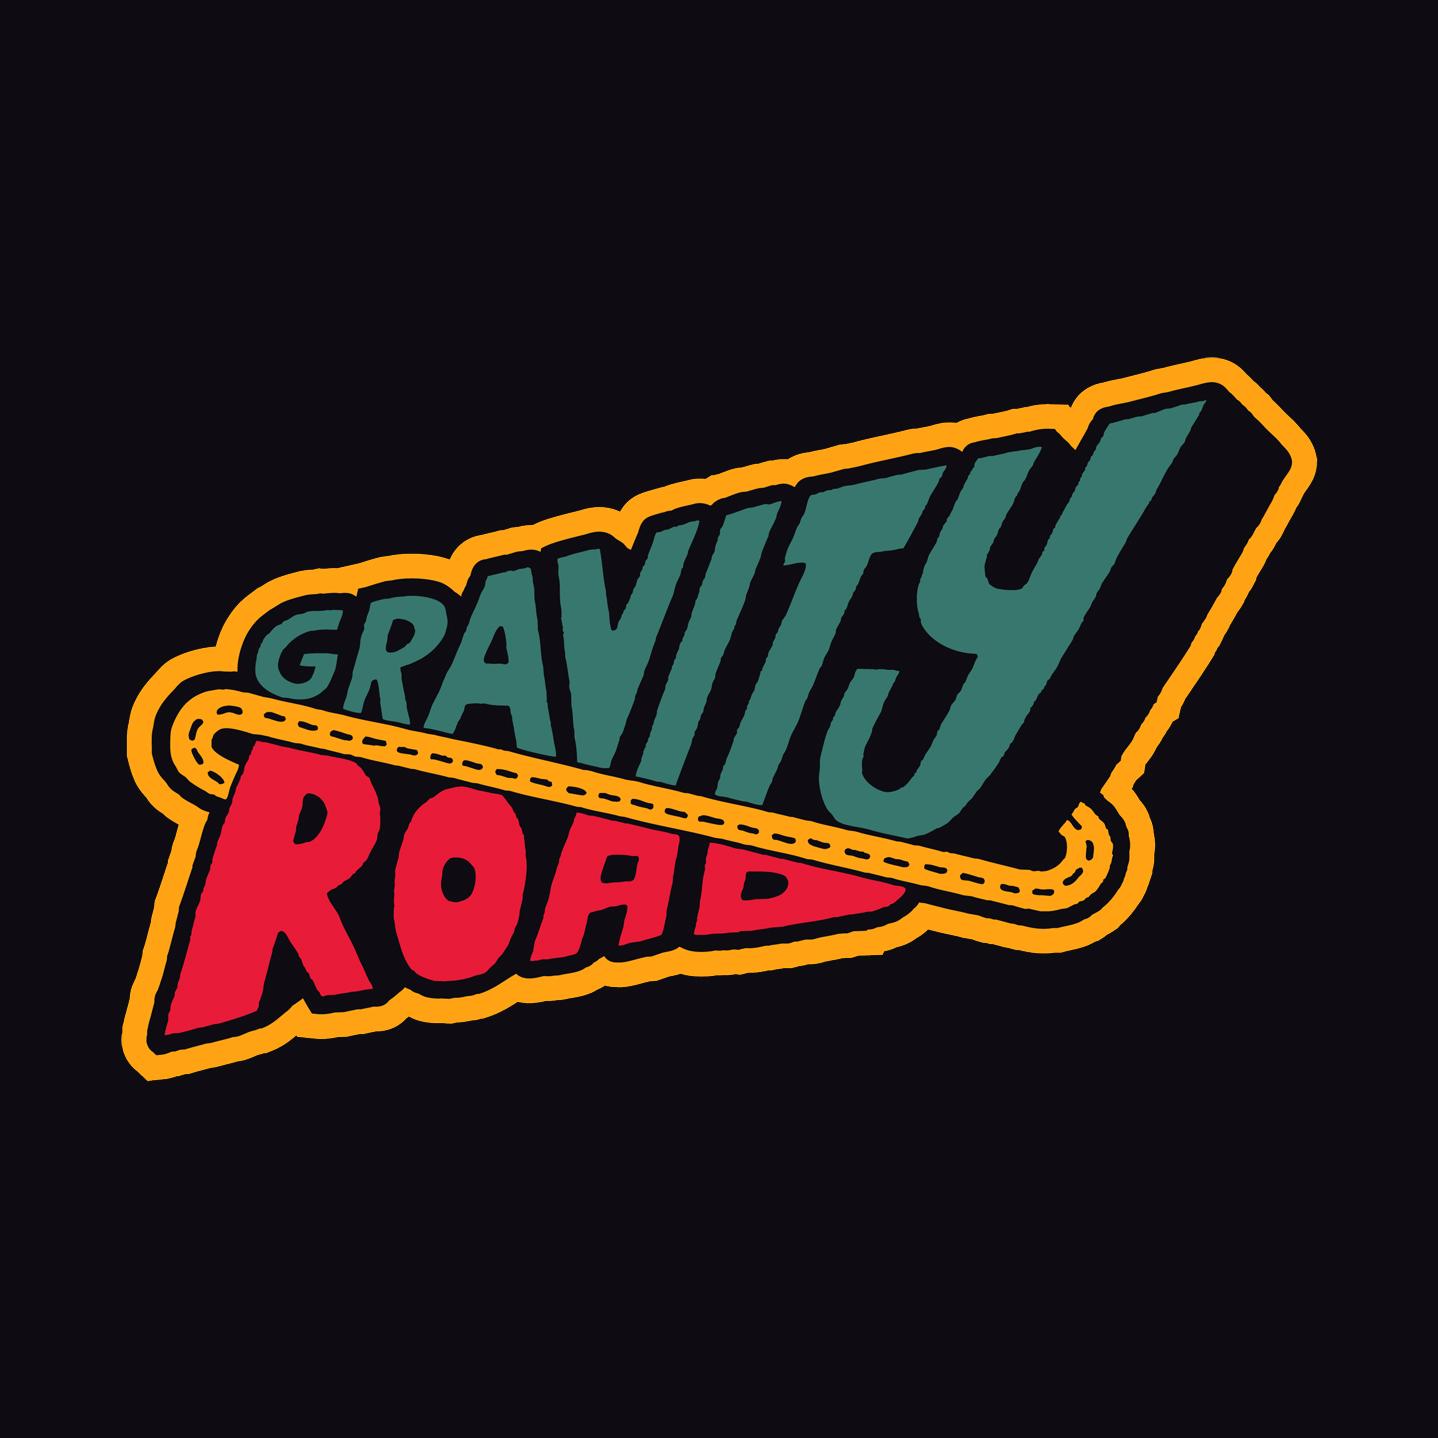 gravity_road_social_logo.jpg